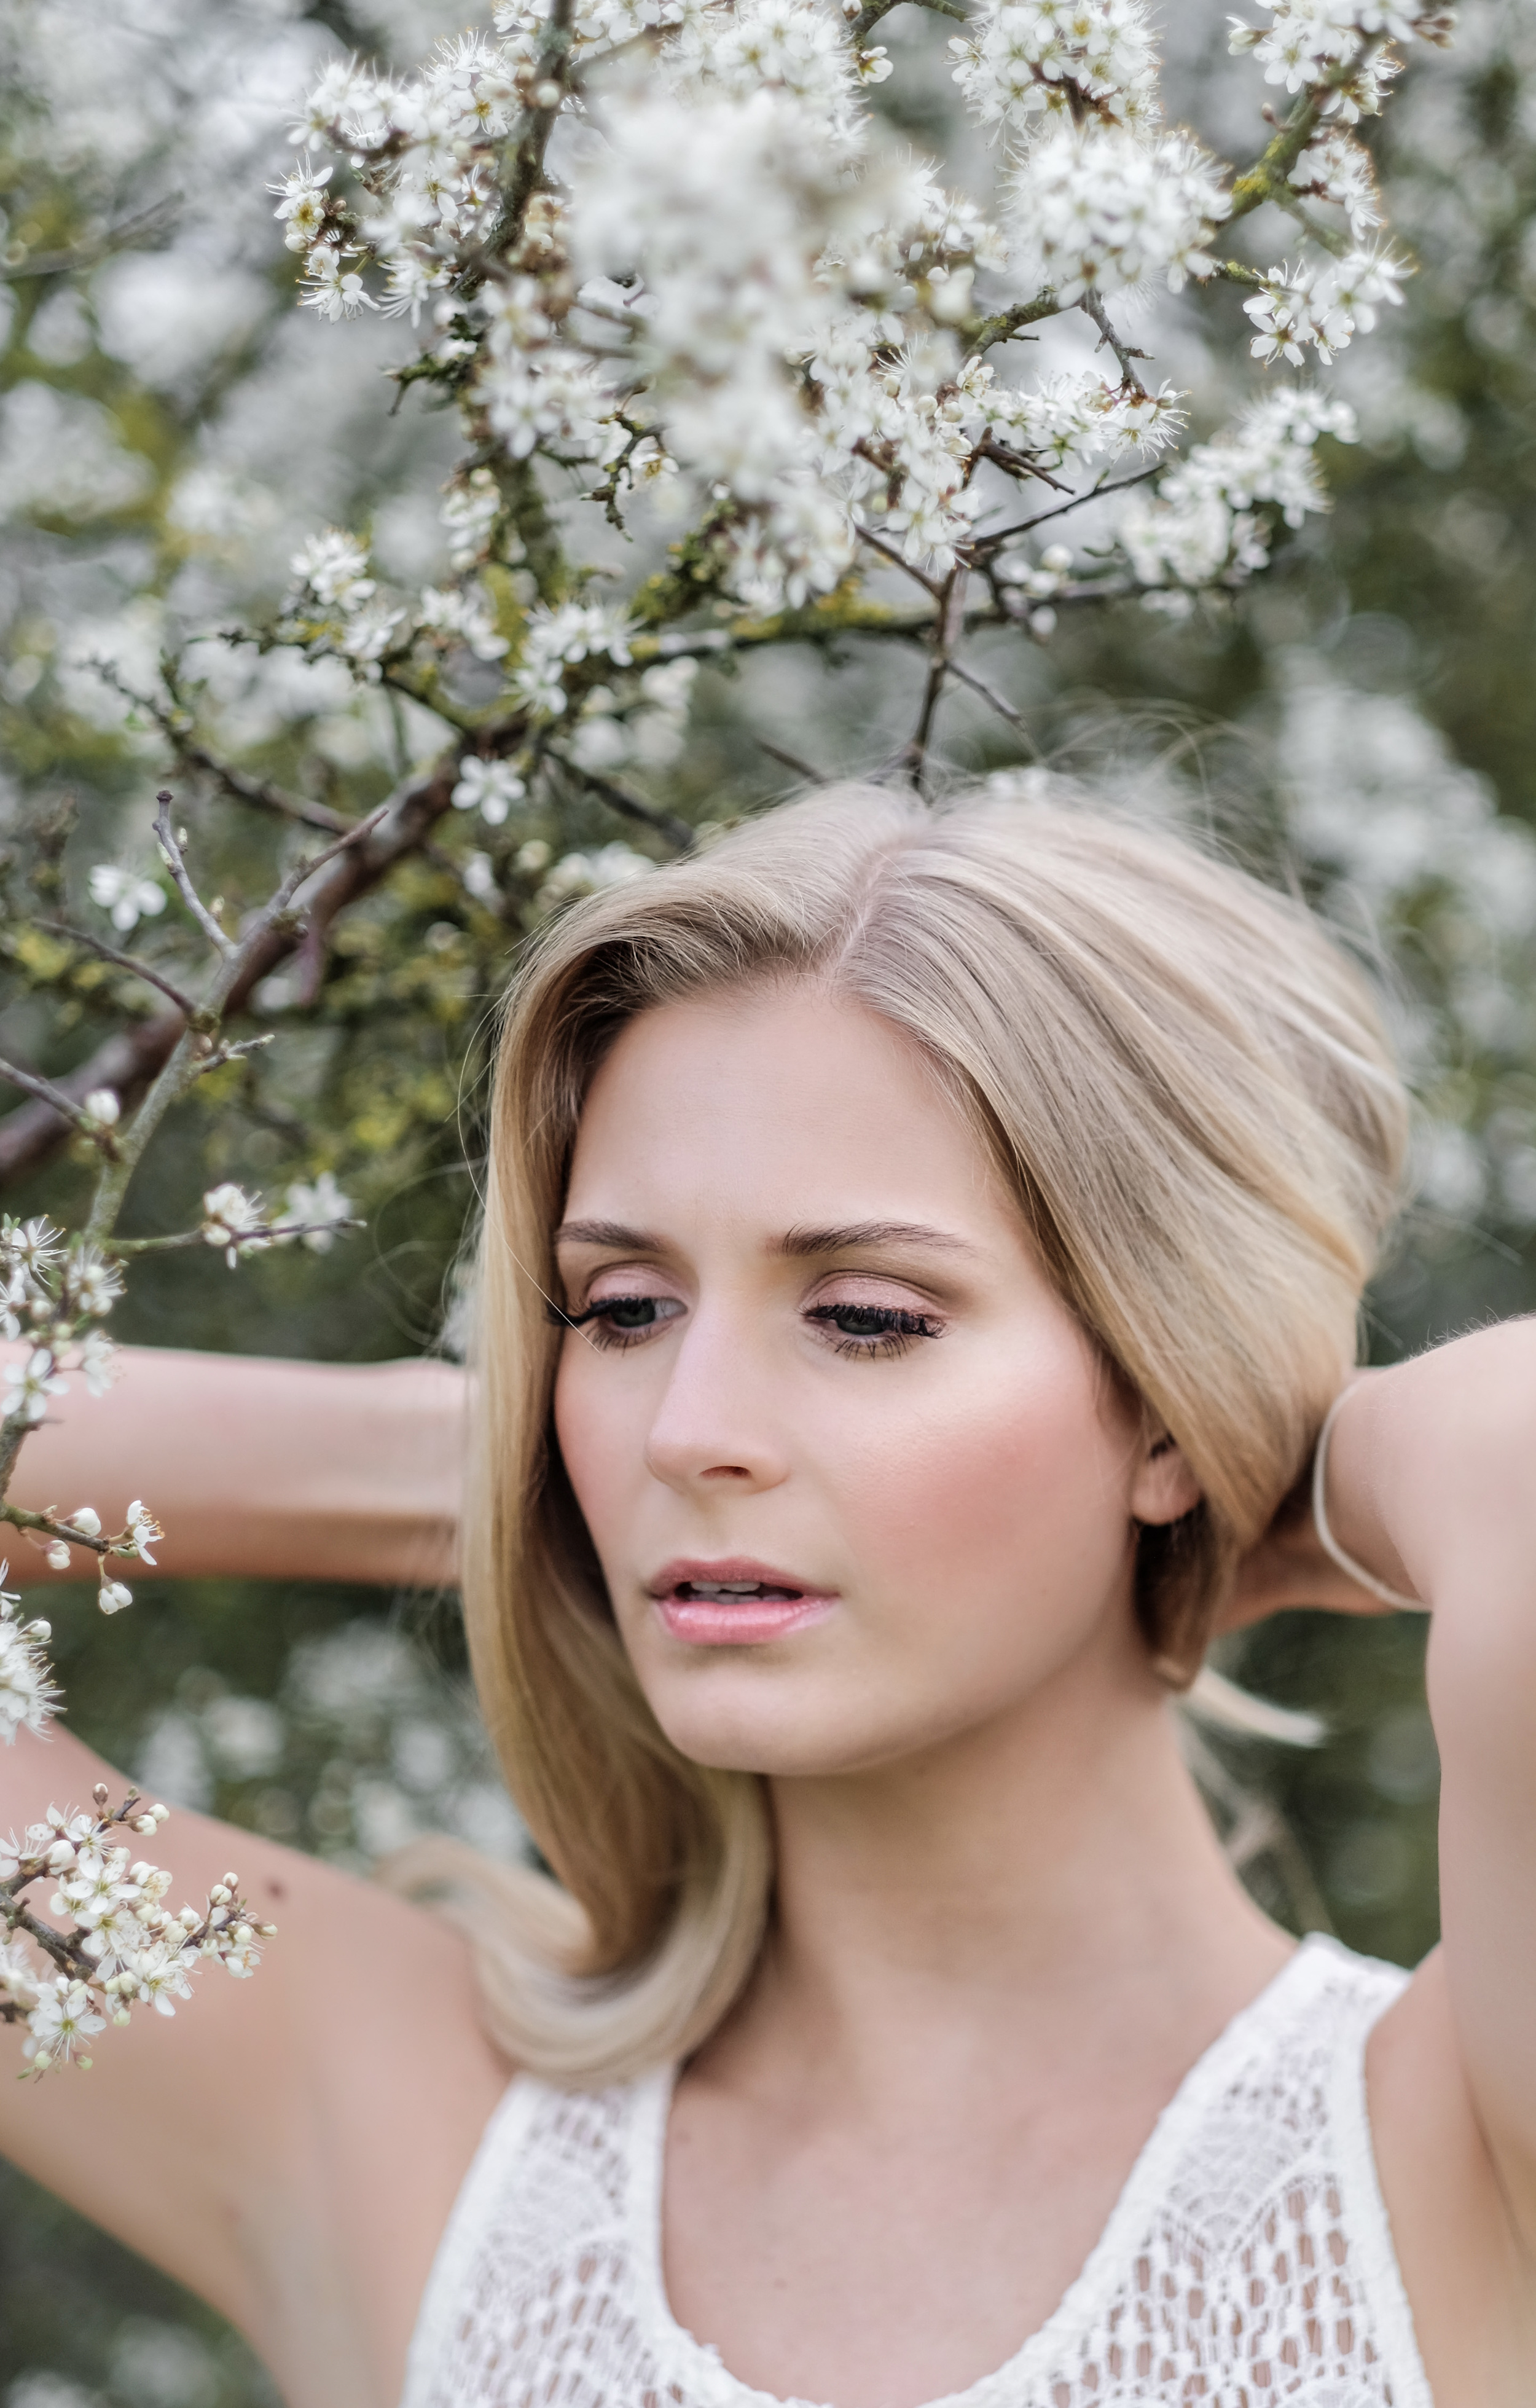 Tara-Florence-Photography-Spring-Bloom-3.jpg